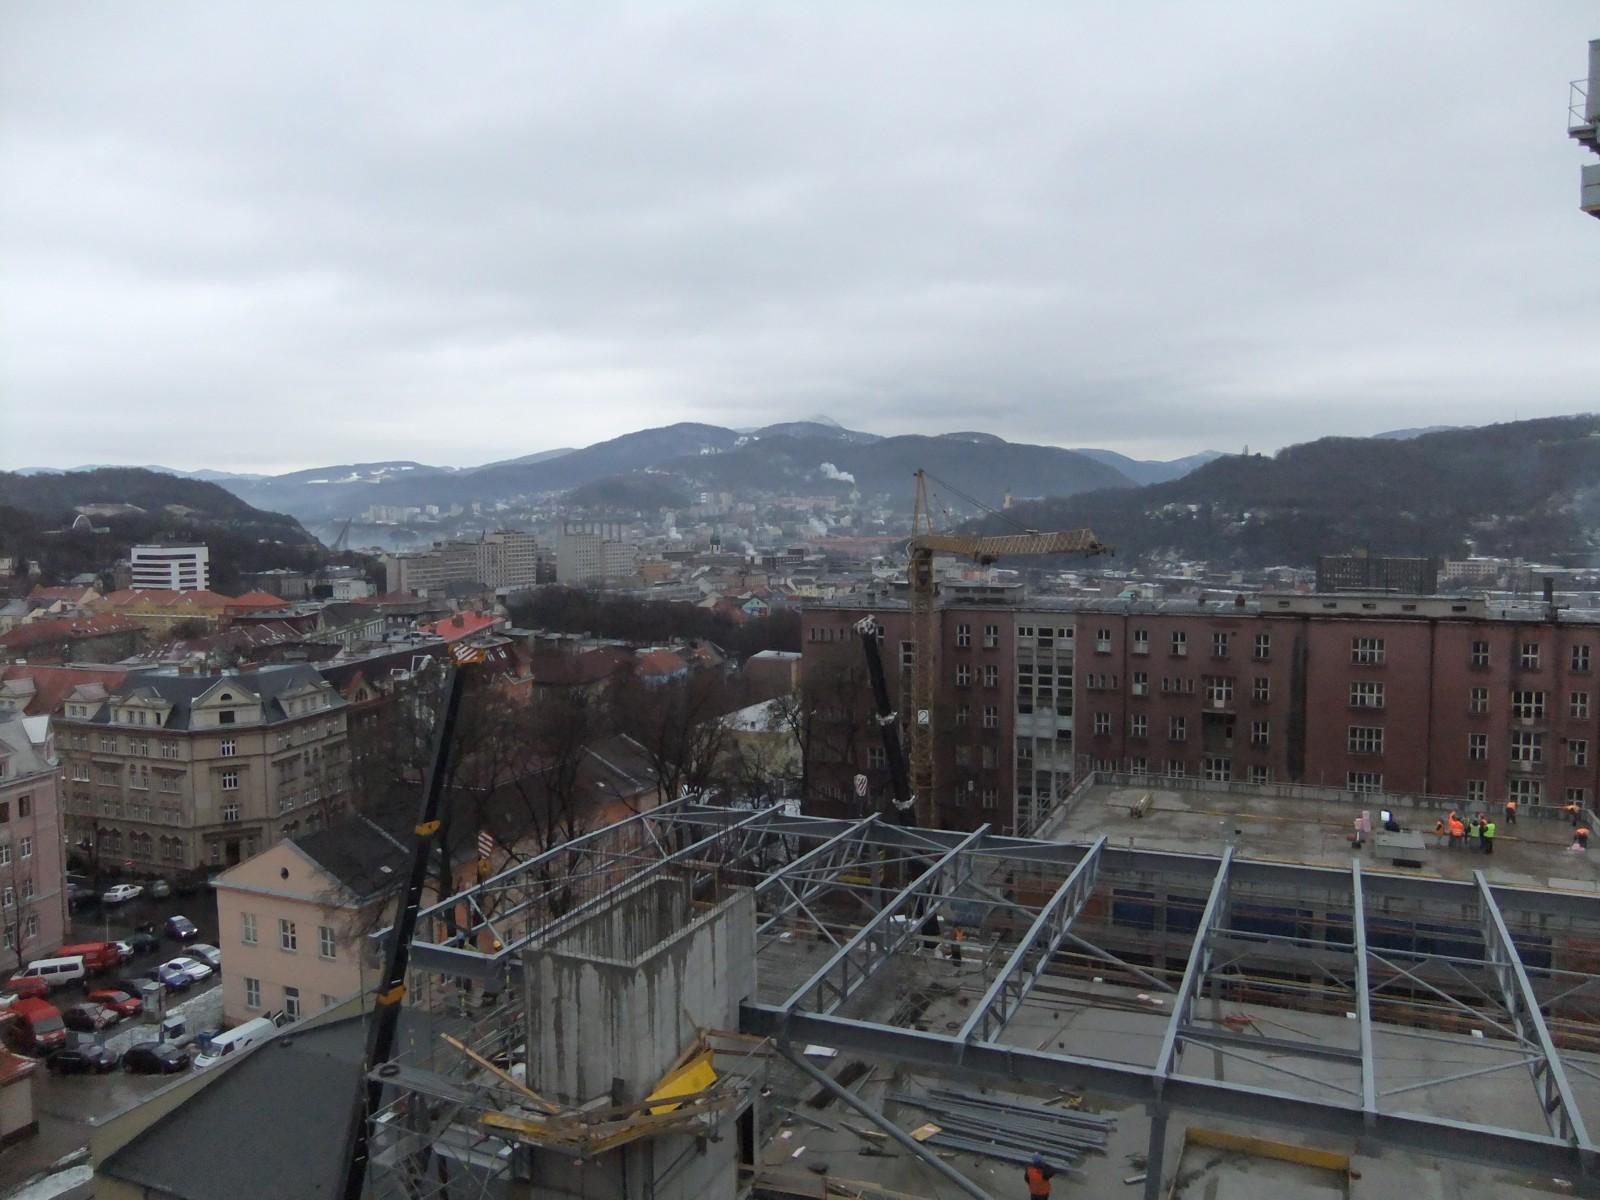 areál Kampusu UJEP v Ústí nad Labem 19-01-2012